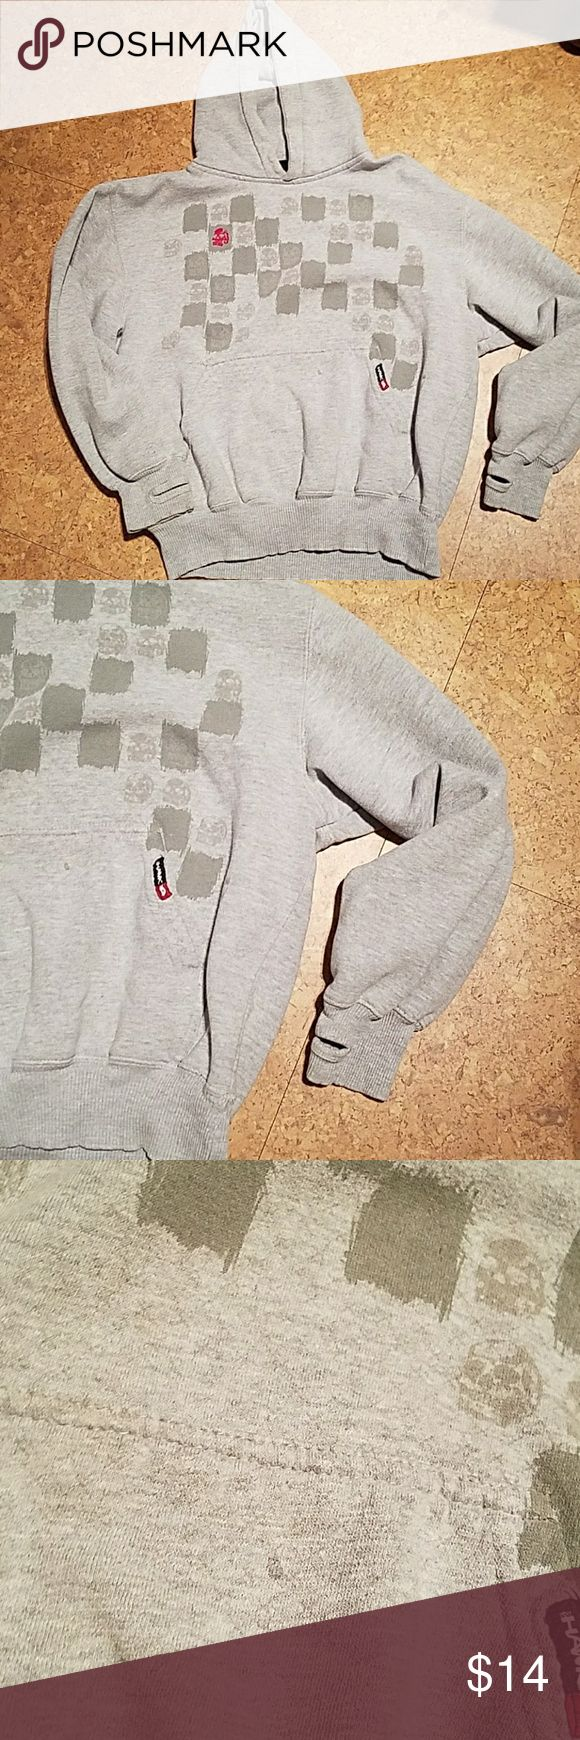 Tony Hawk hoodie Boys XL Gray Tony Hawk hoodie.  Thumb holes.   Small stain on front pocket (pic 3) Tony Hawk Shirts & Tops Sweatshirts & Hoodies